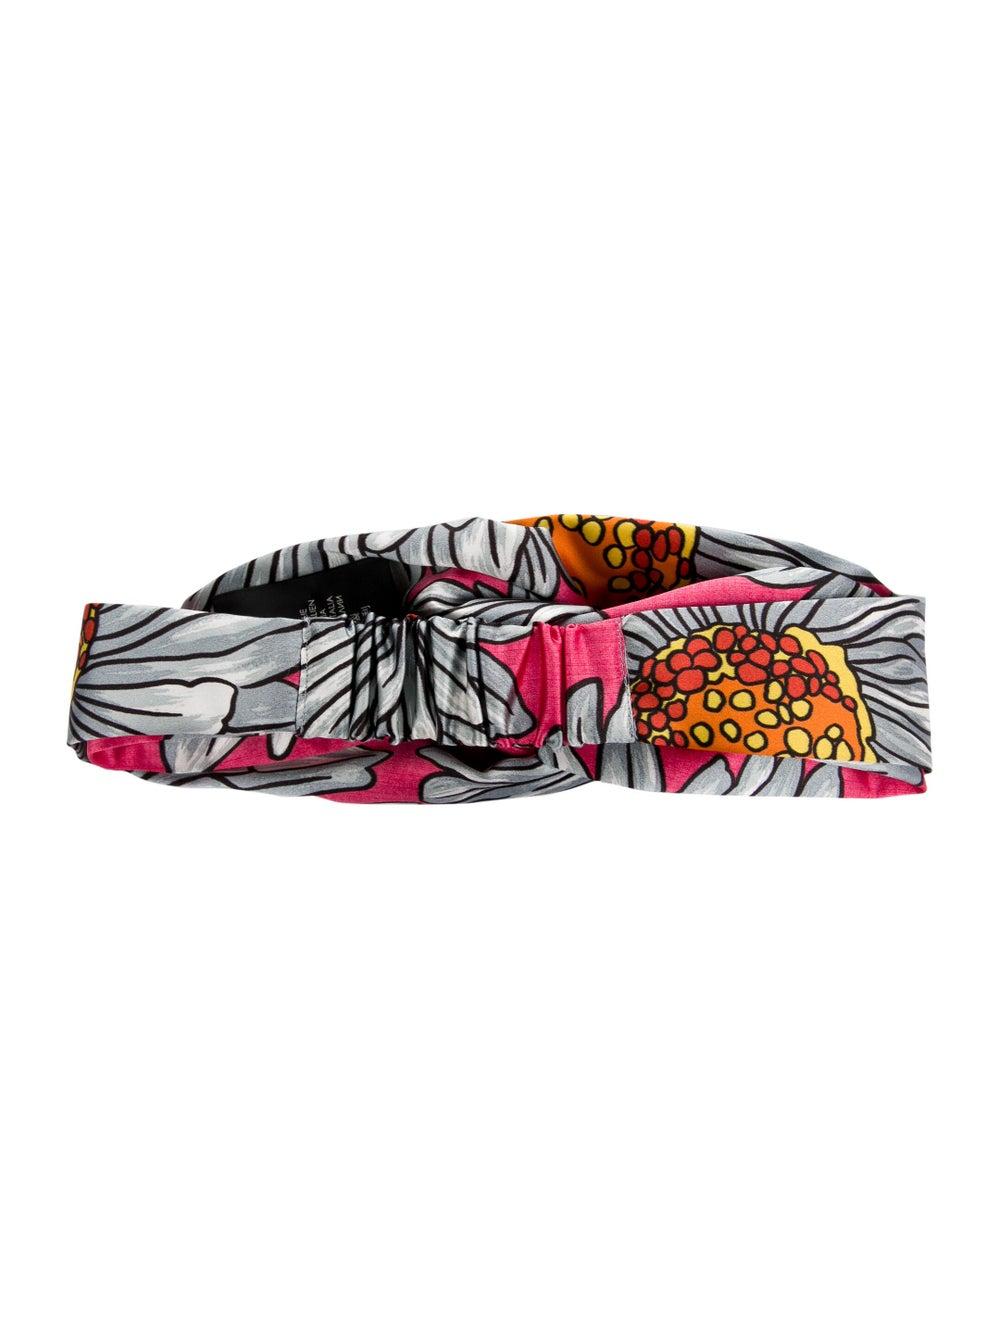 Gucci Floral Silk Headband Pink - image 2